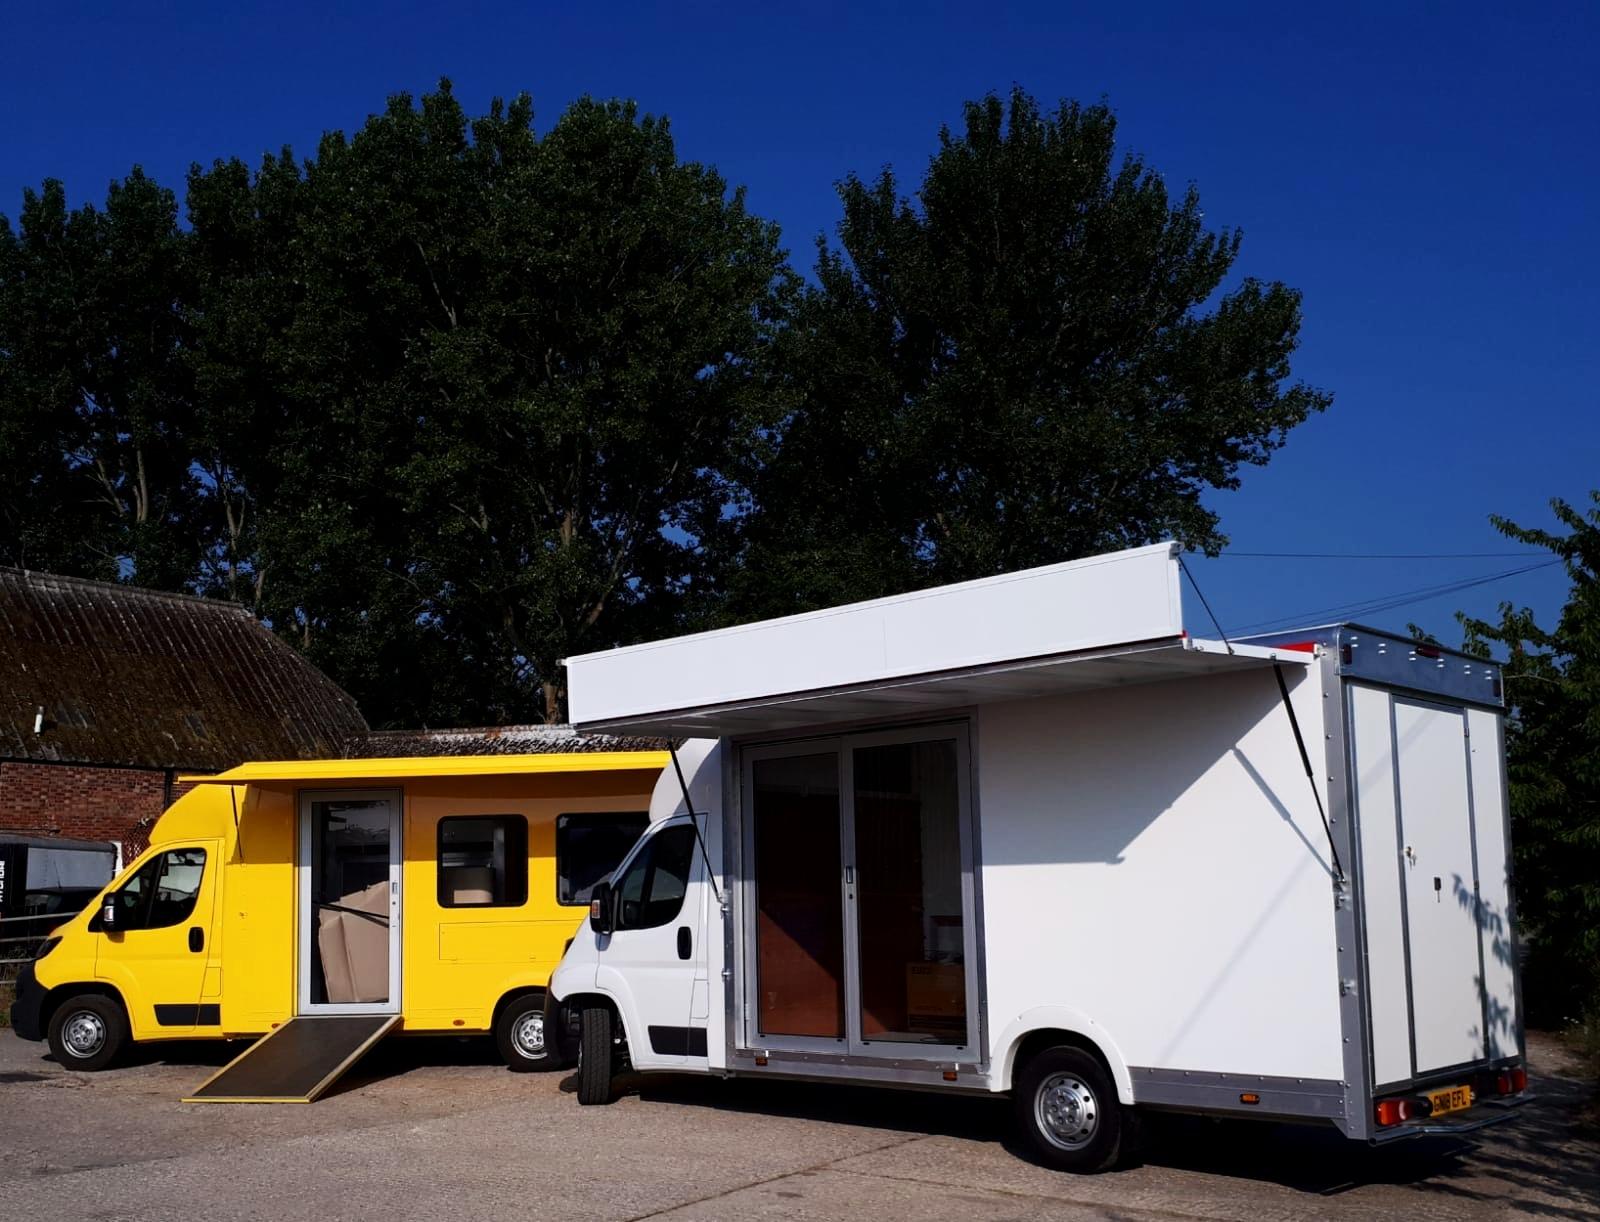 Promotional Vehicle   Marketing Truck   Exhibition Truck   Exhibition Trailer